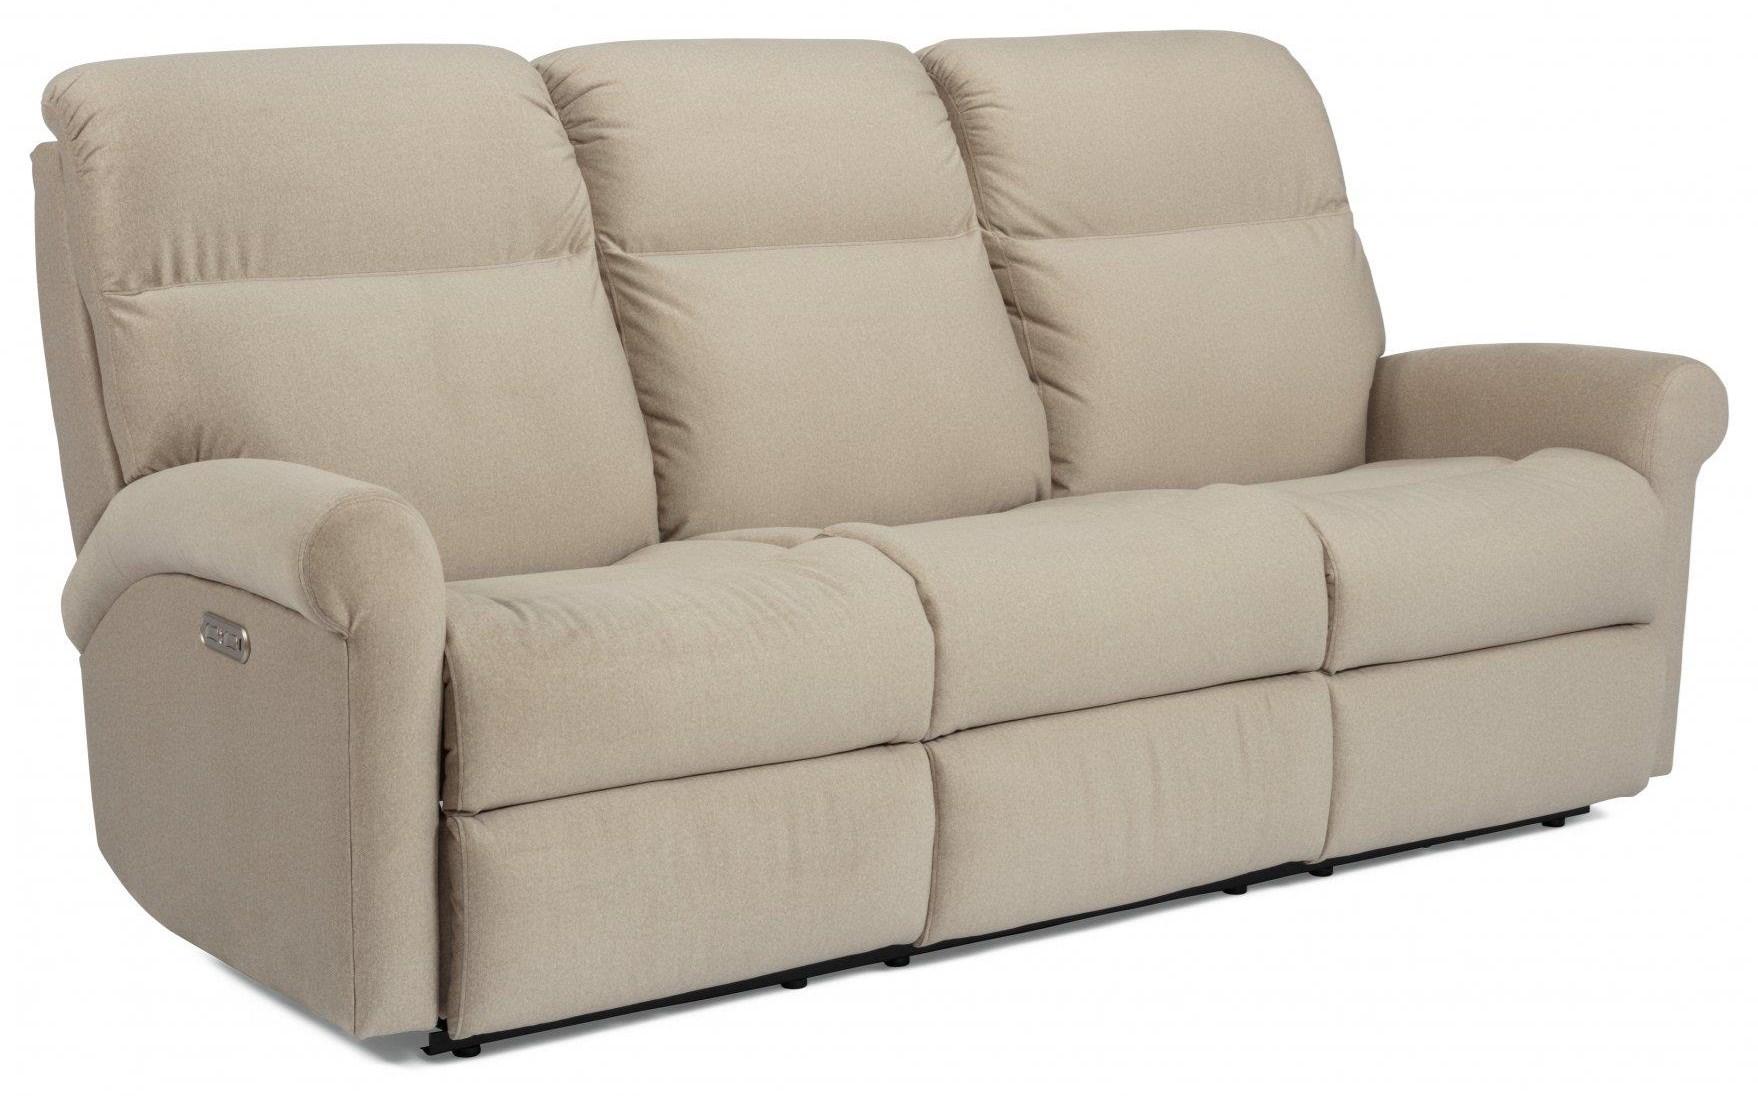 Davis POWER SOFA by Flexsteel at Value City Furniture